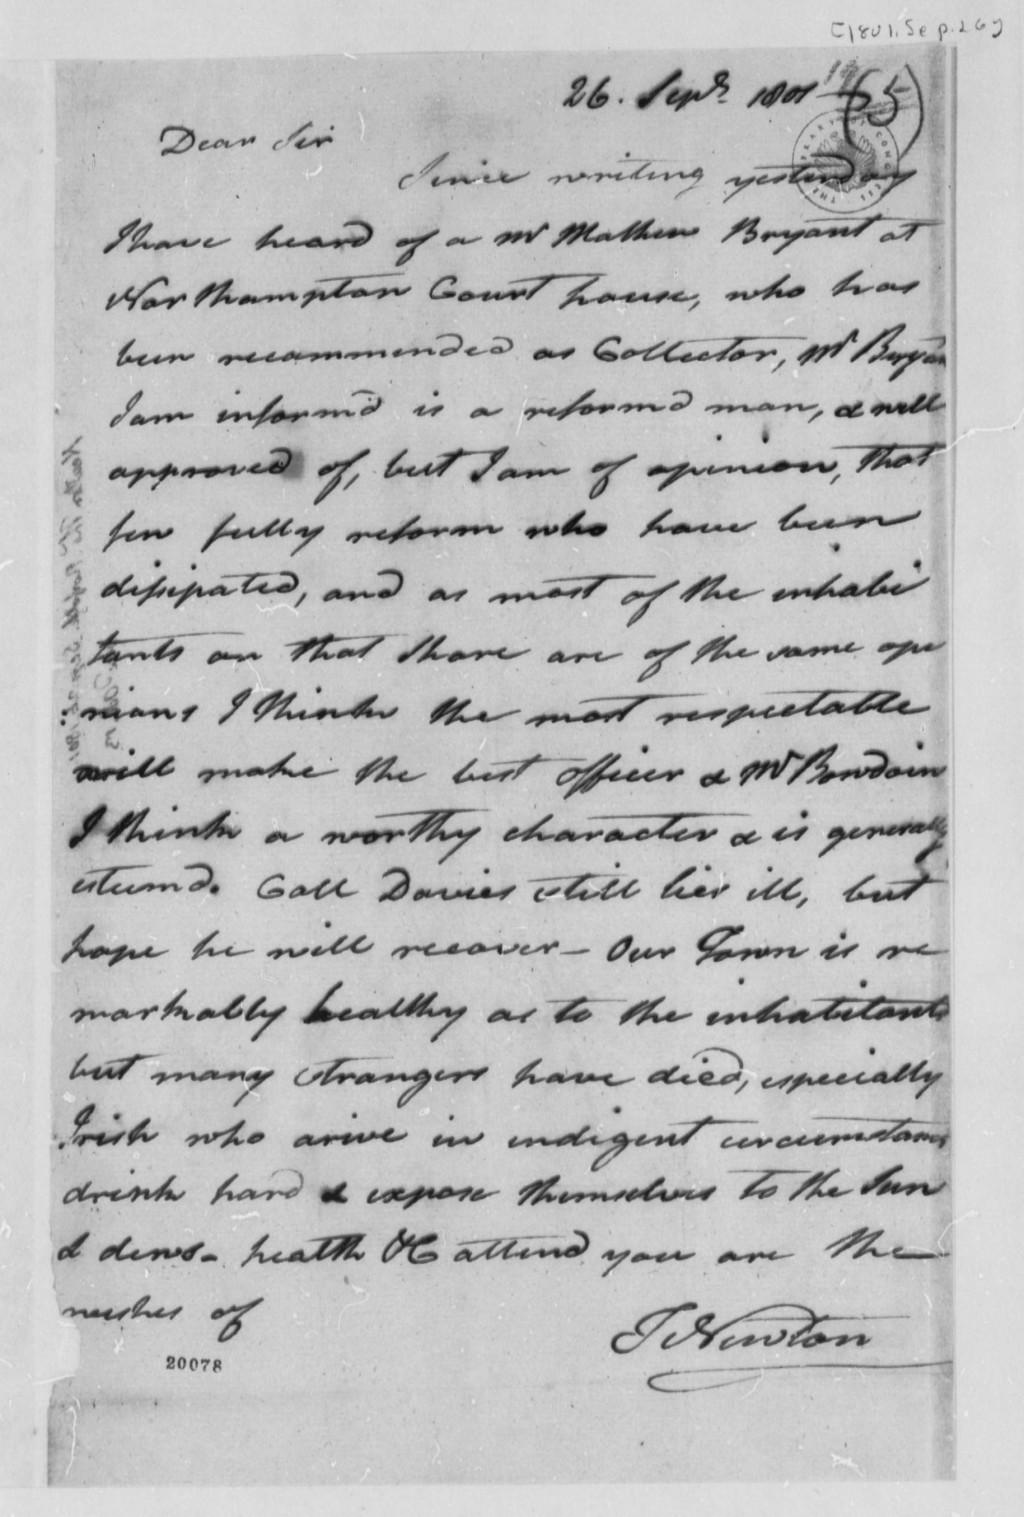 010 Thomas Jefferson Essay Magnificent On Education Questions Outline Large